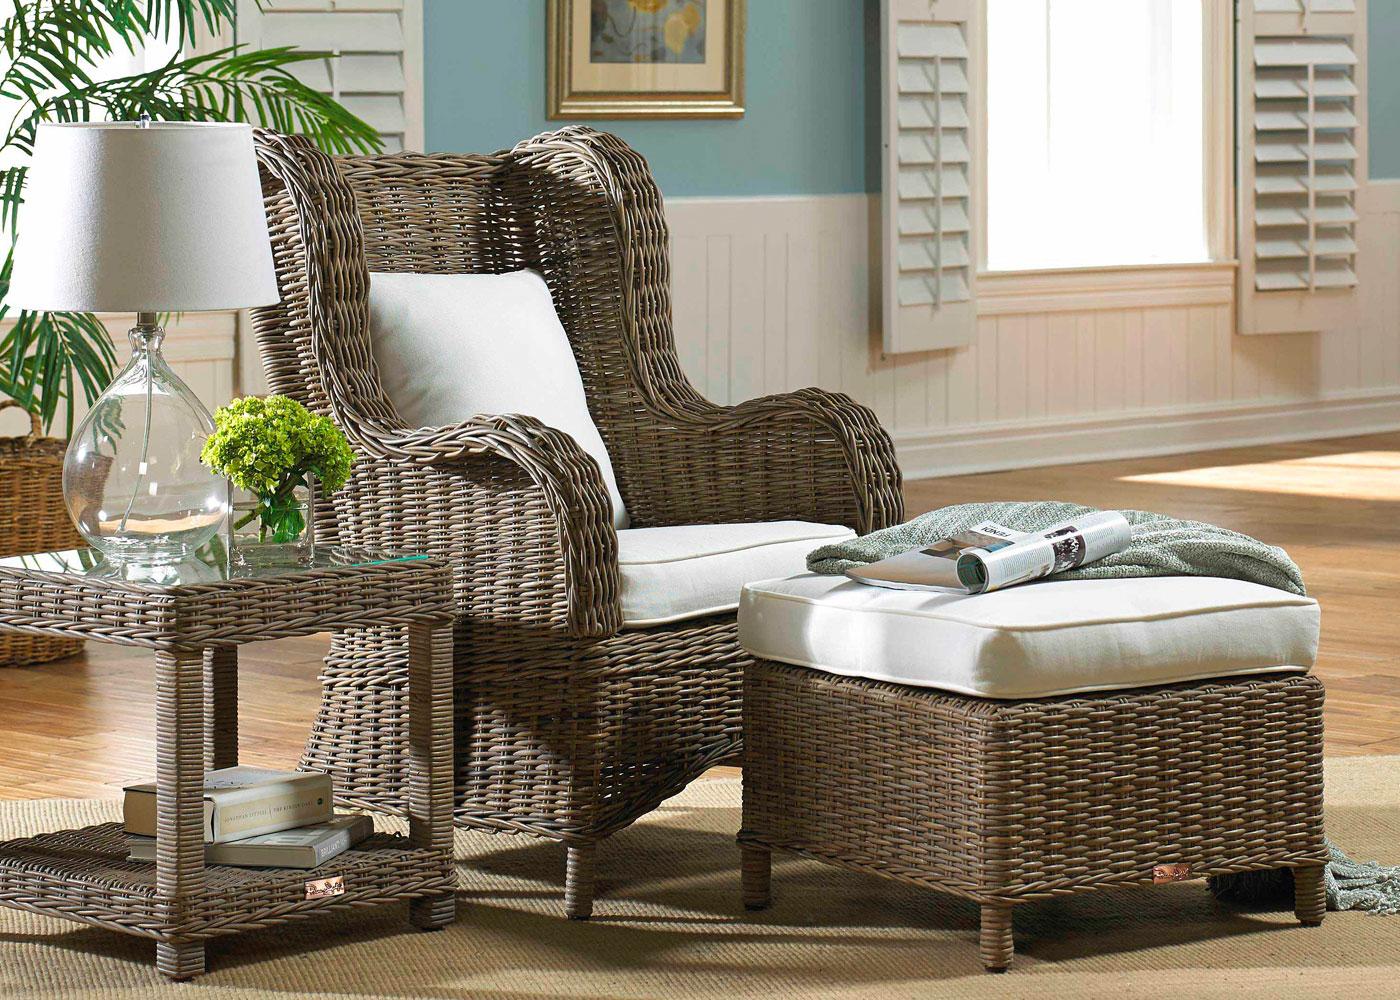 sunroom furniture 1; 2; 3 LZLJQEK